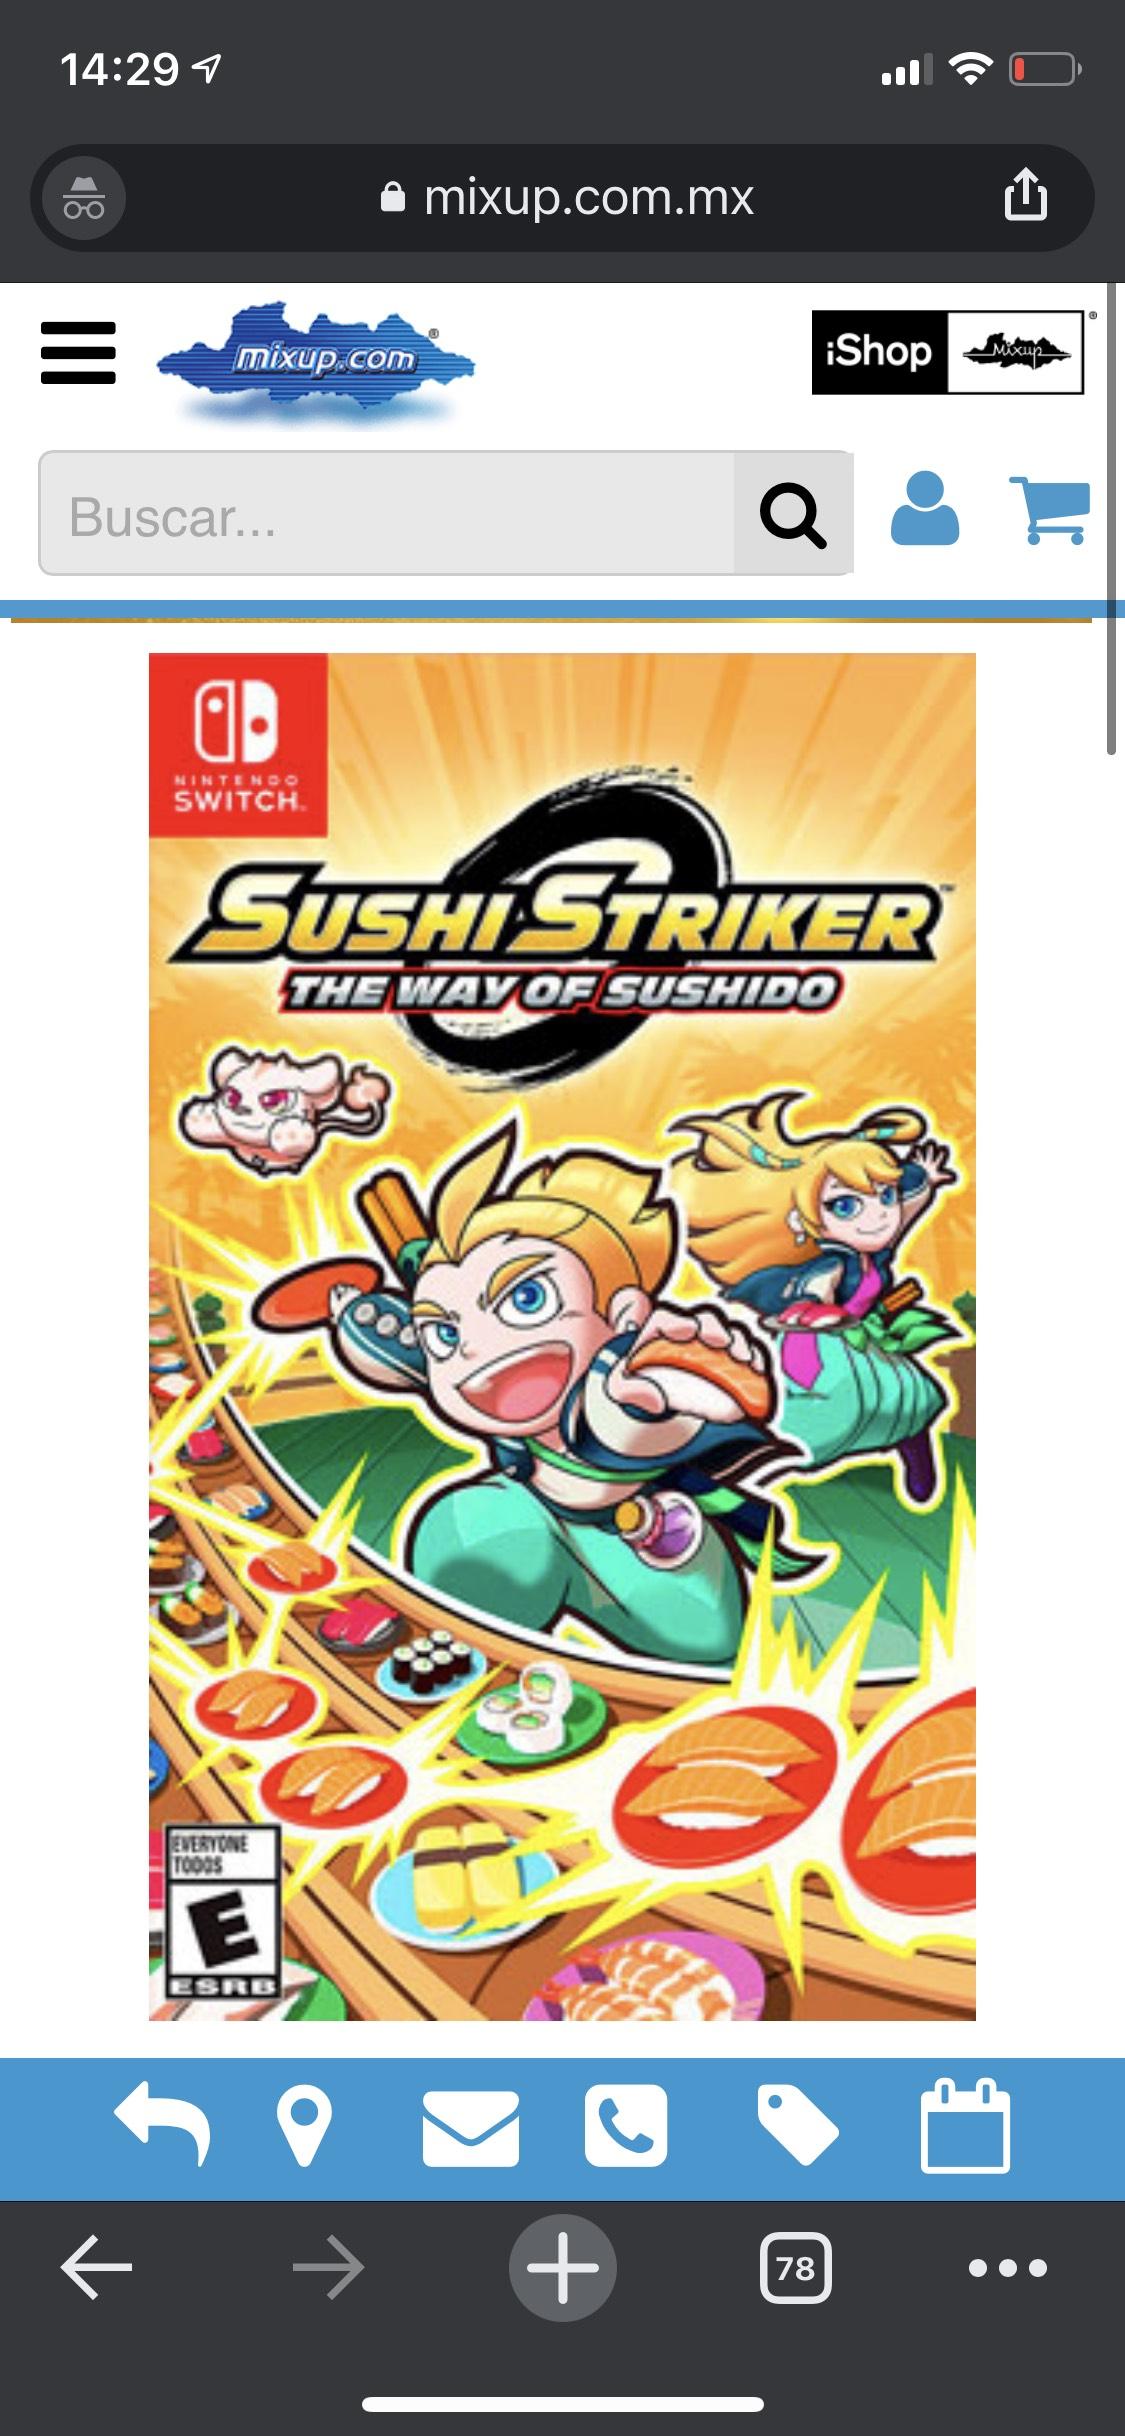 Nintendo Switch, Sushi Striker en Mixup